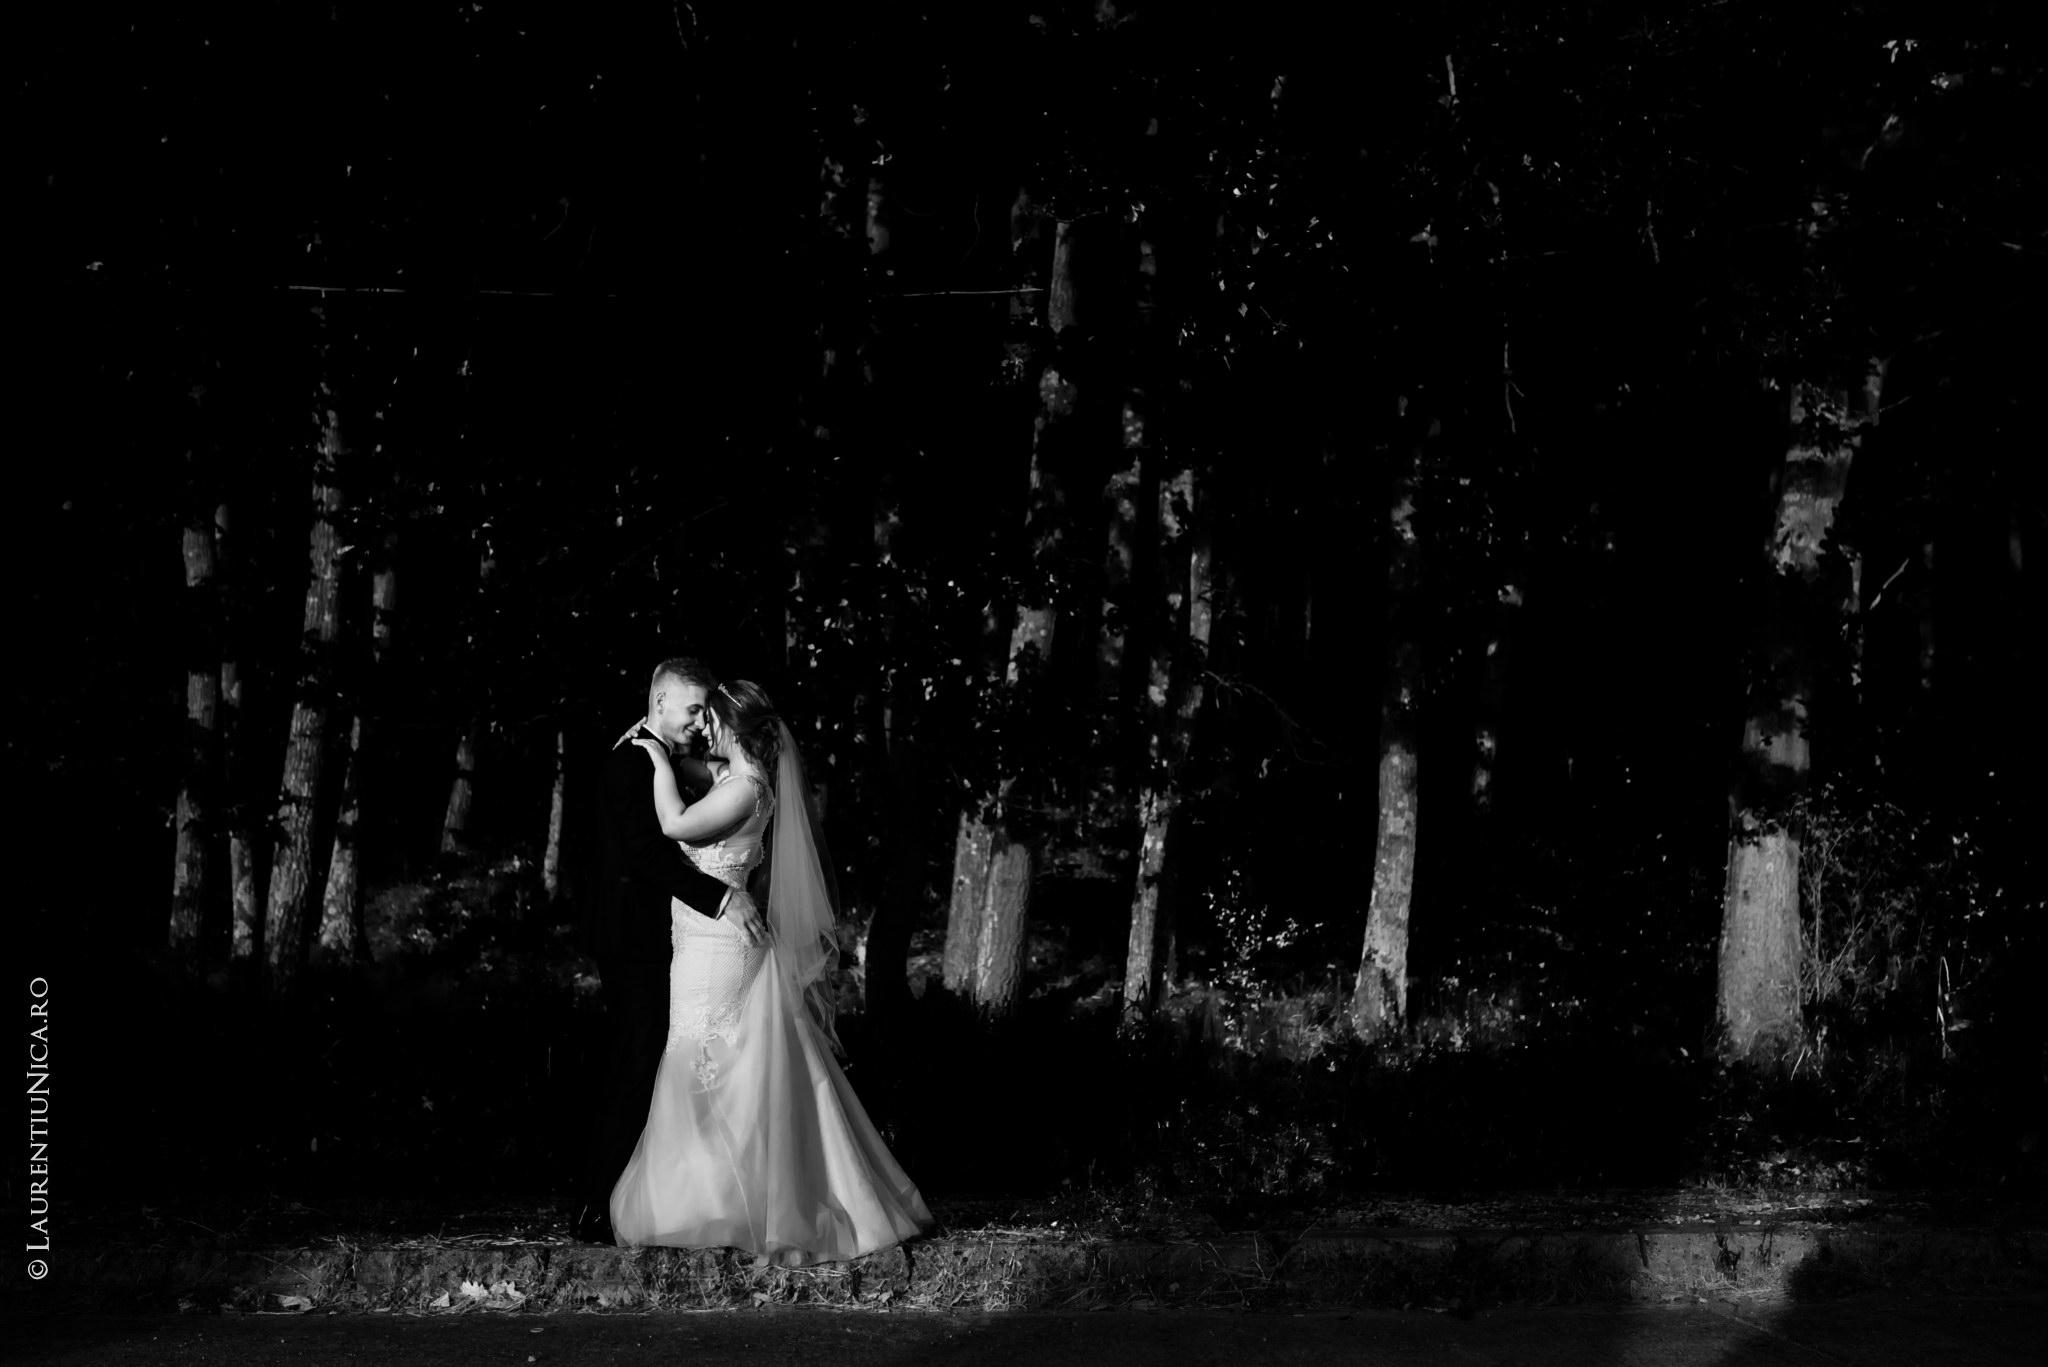 fotografii nunta Roxana si Cosmin fotograf nunta laurentiu nica 35 - Roxana & Cosmin | Fotografii nunta | Ticleni, judetul Gorj